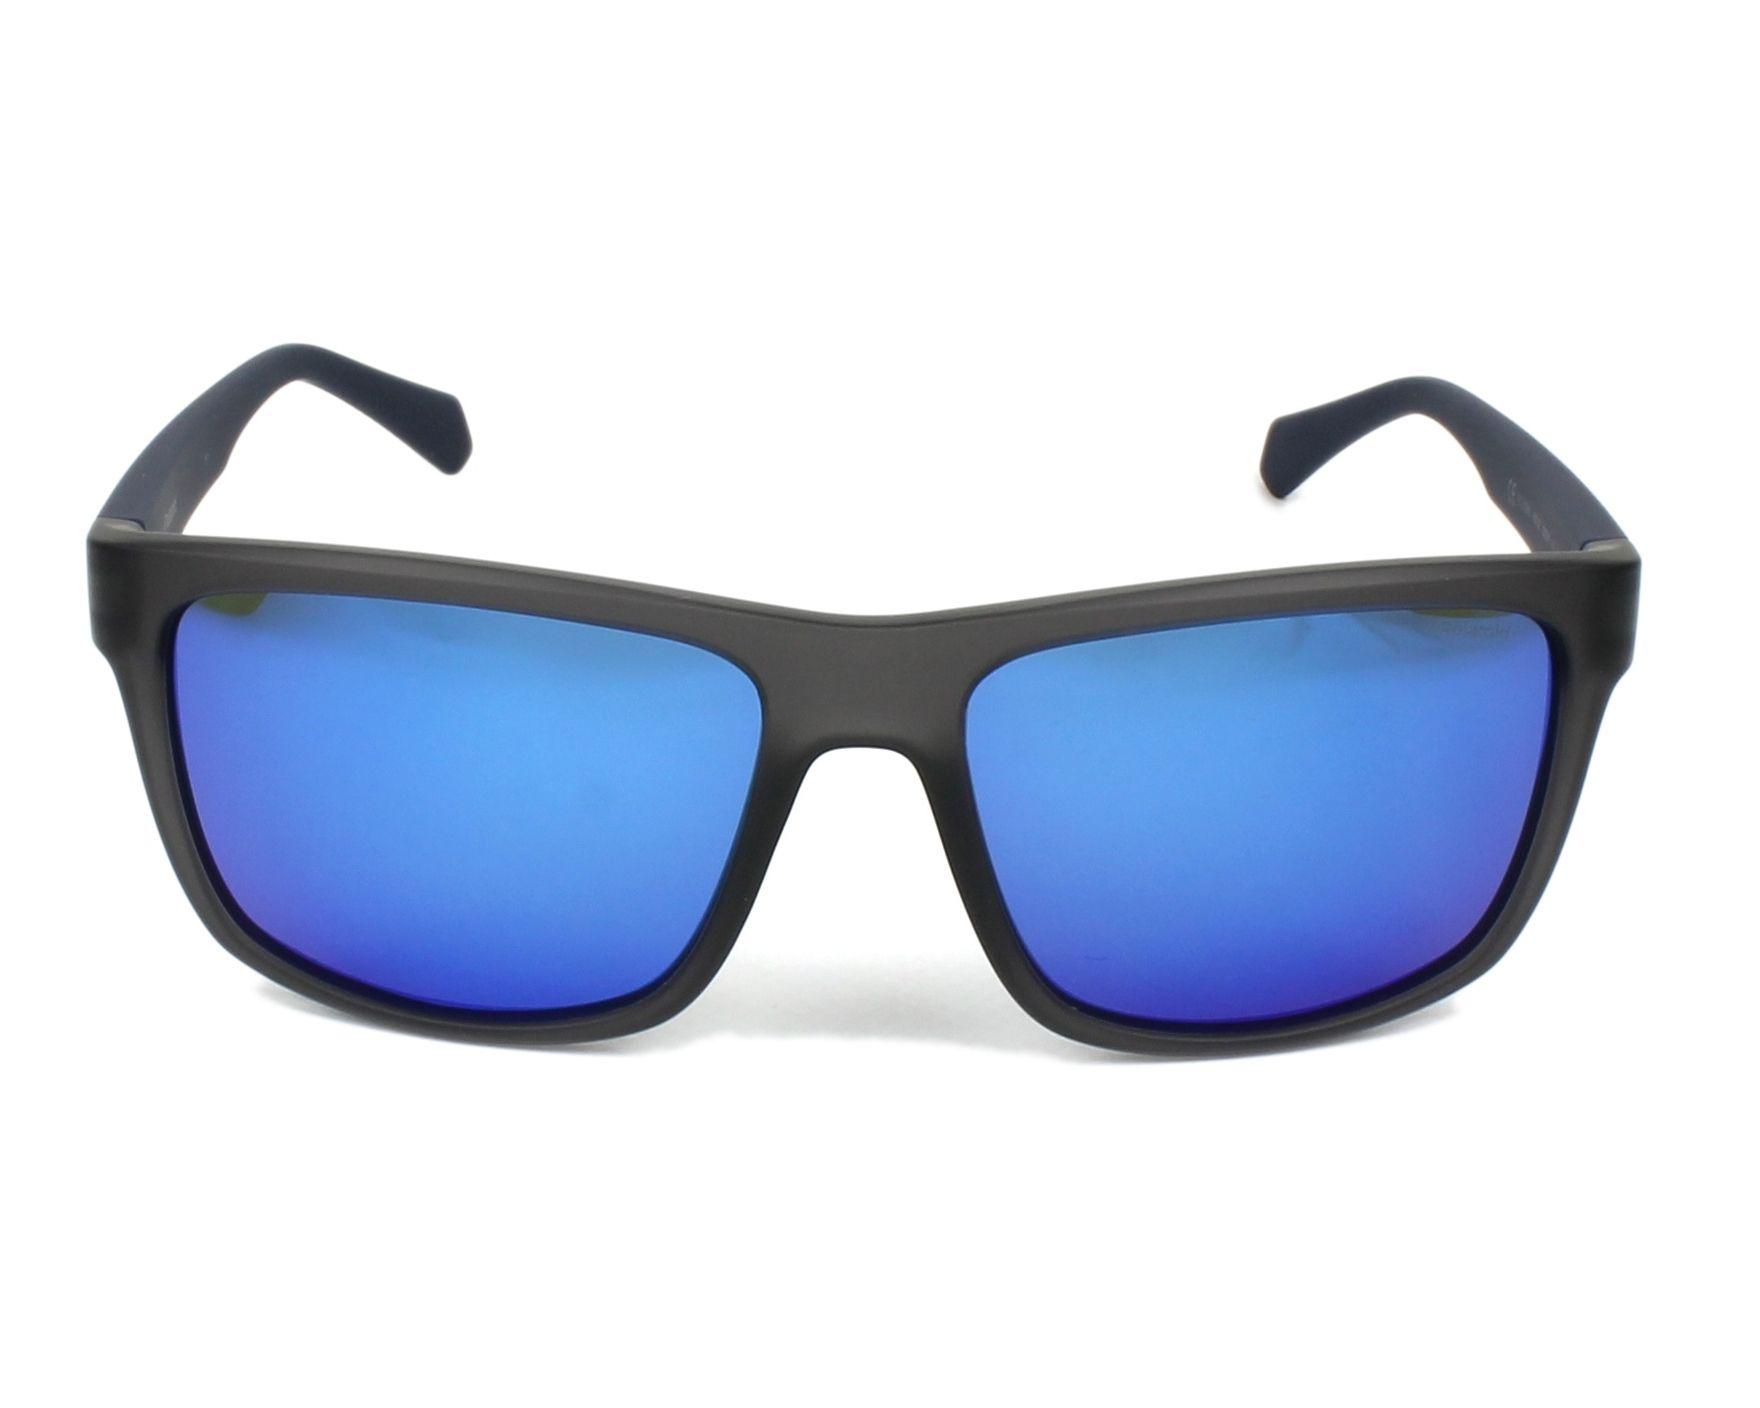 5861521479b5 Sunglasses Polaroid PLD-2058-S RCT/5X 55-16 Grey Blue front